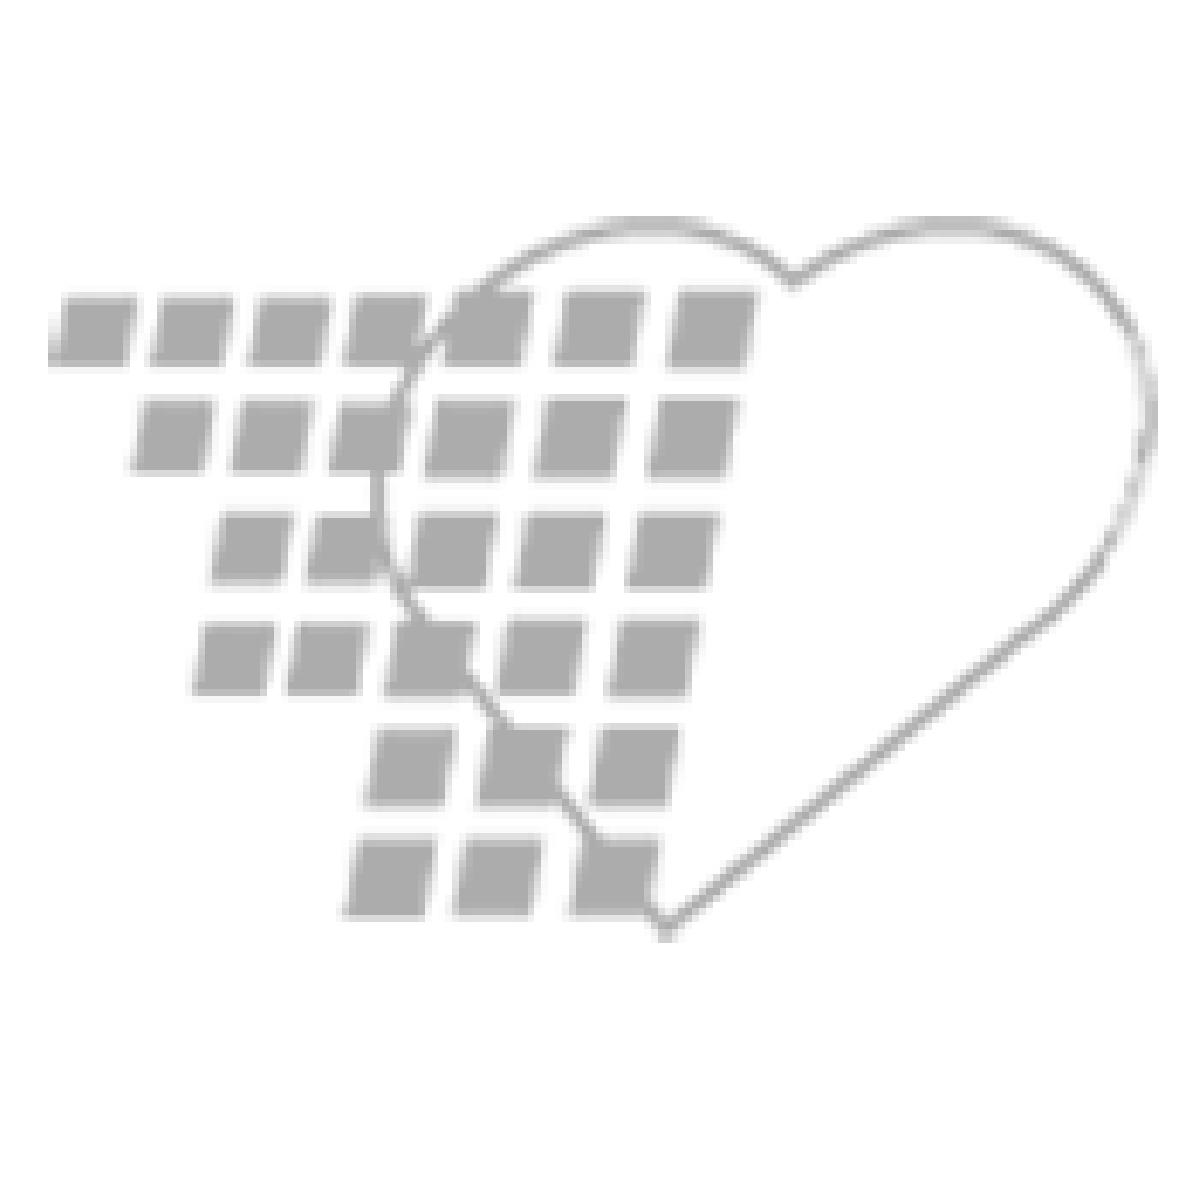 09-31-9915 Cardiovascular Disease Chart